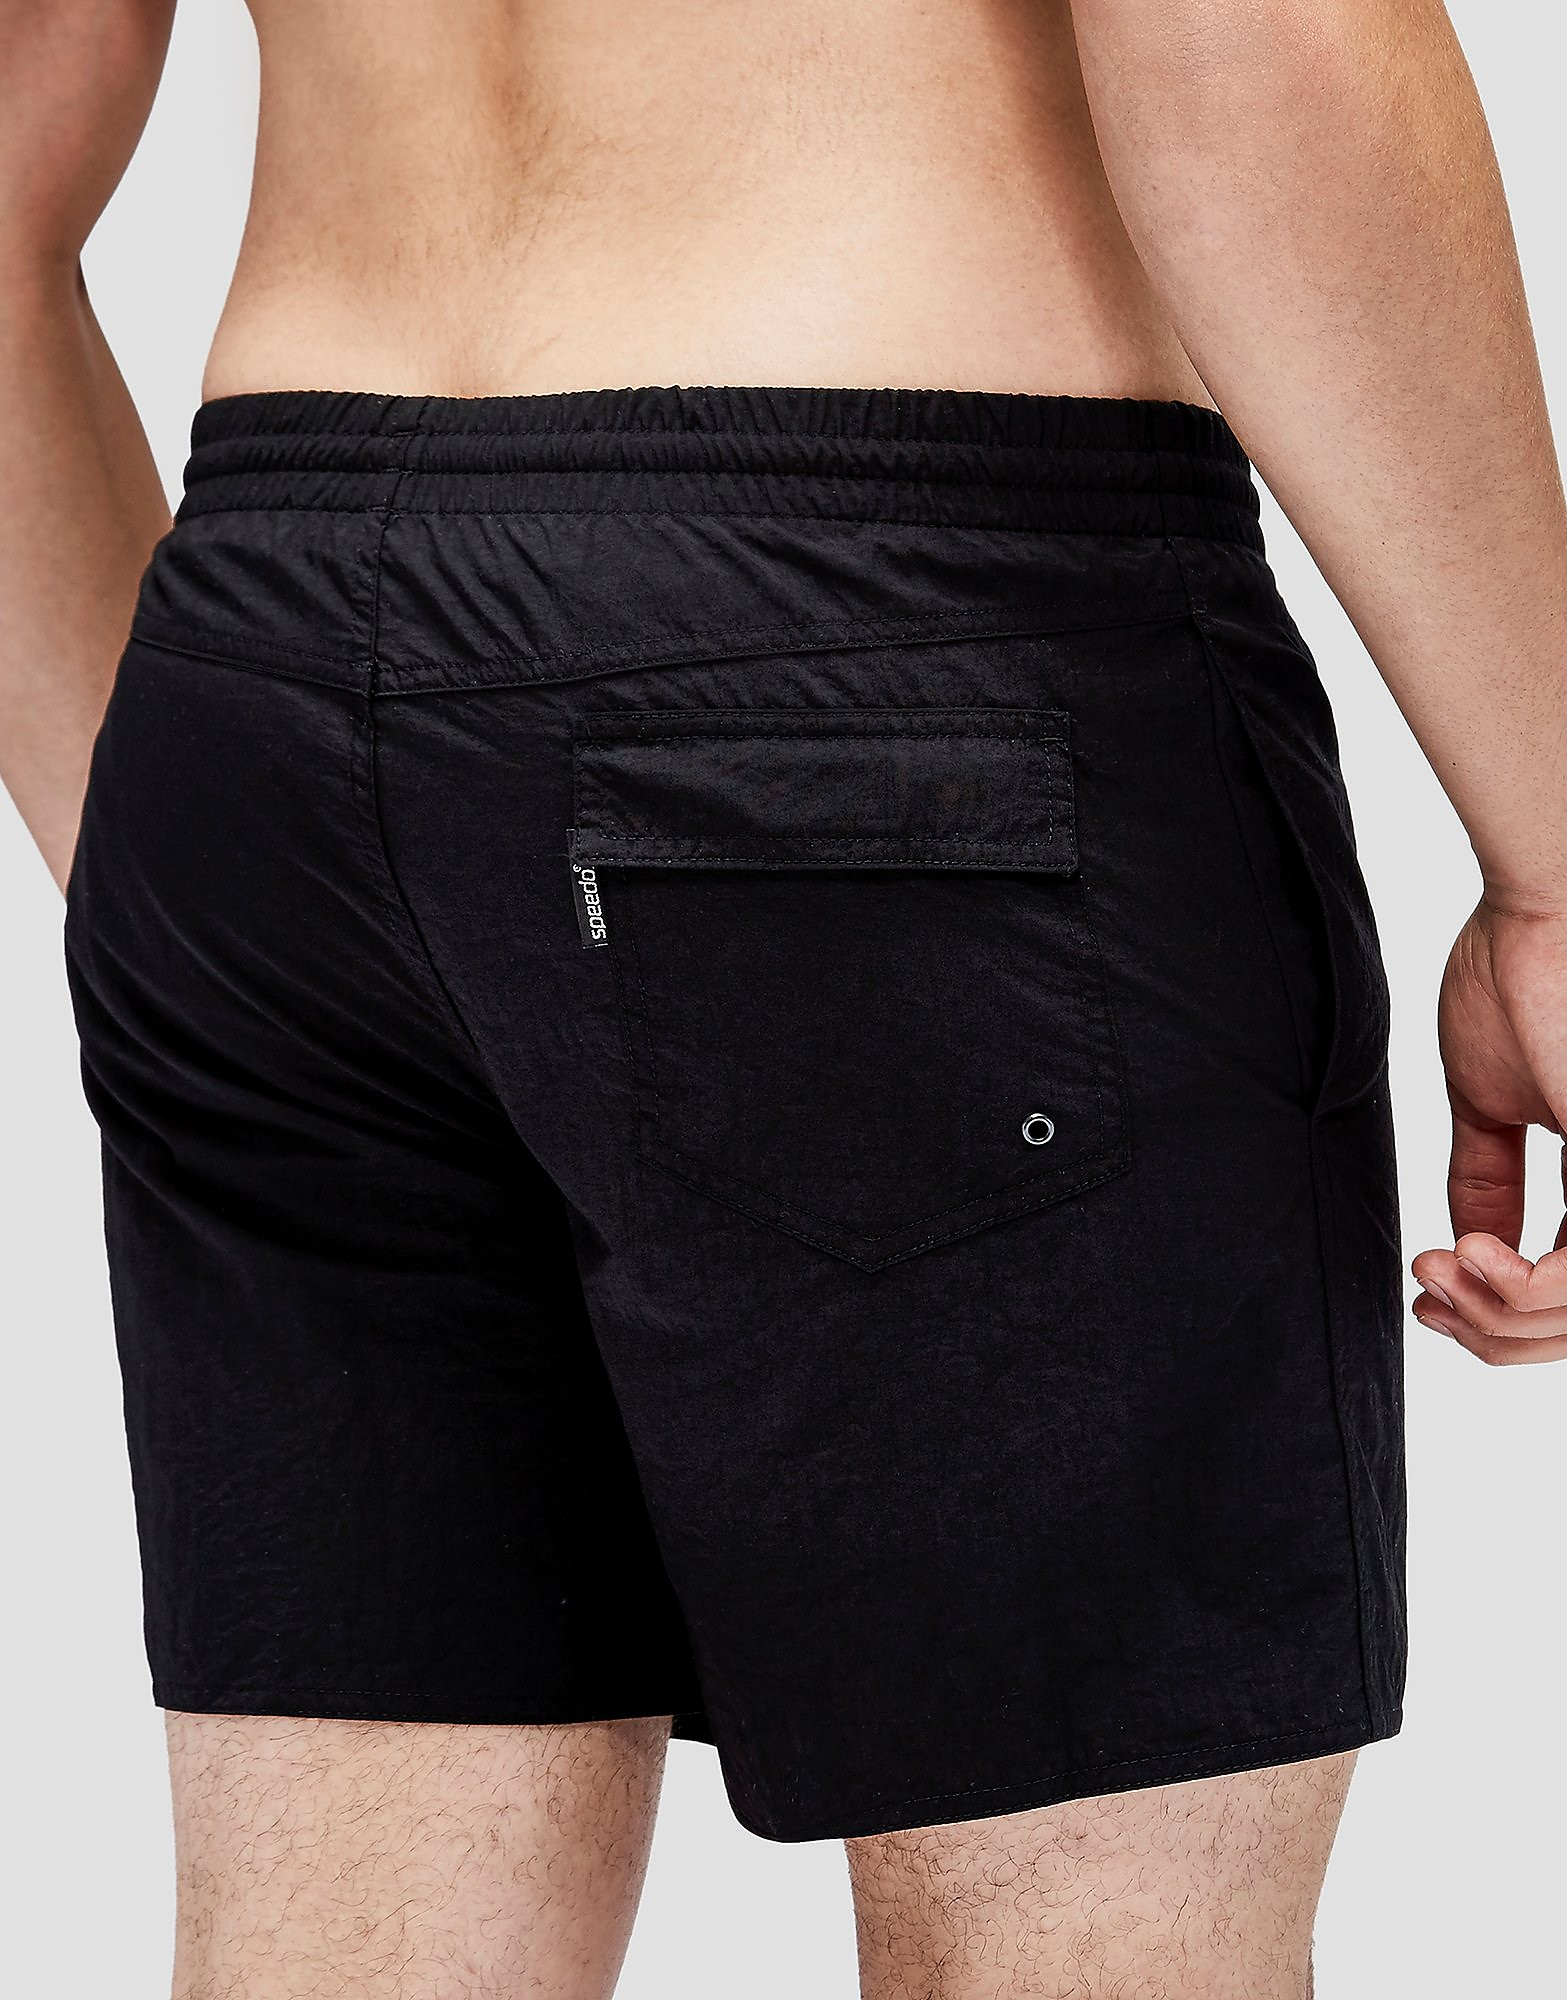 Speedo Scope 16 Inch Water Shorts